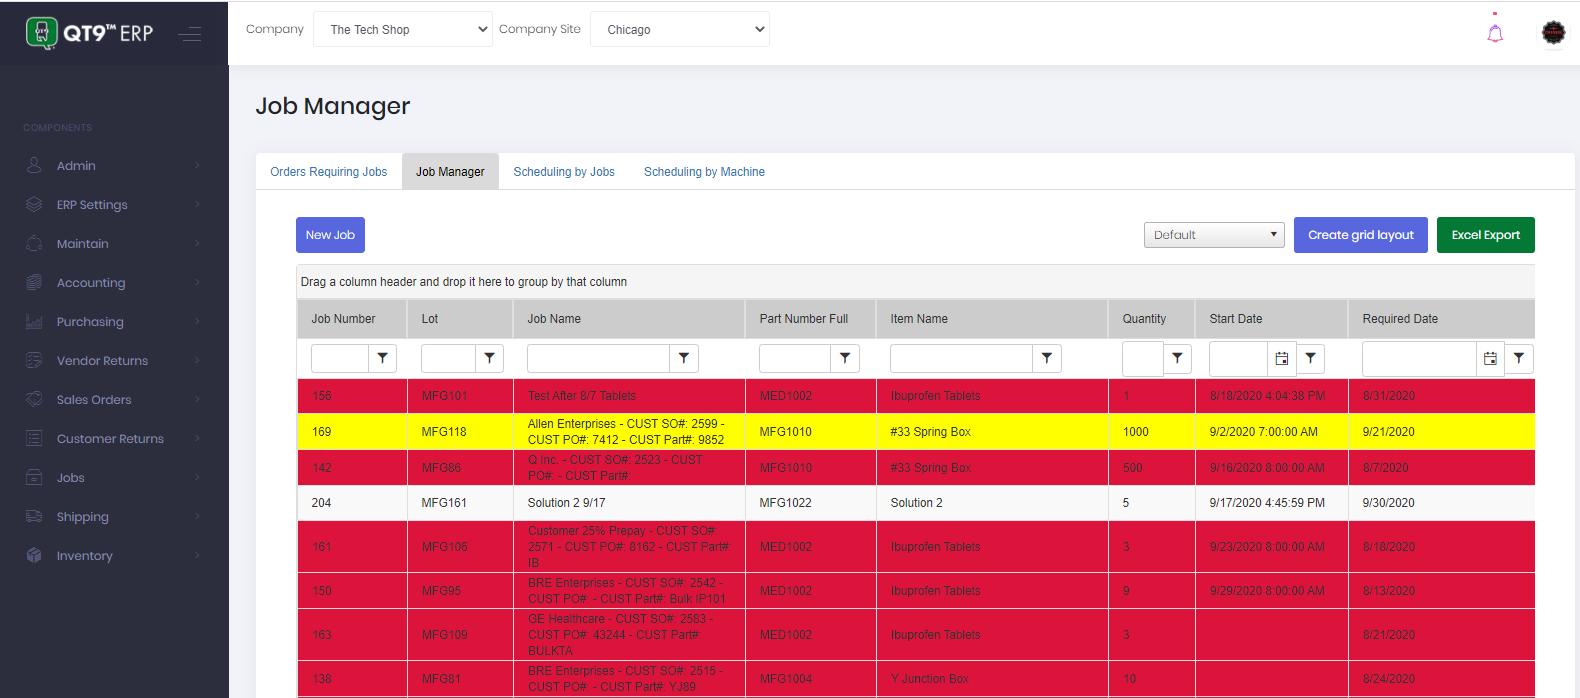 Job Manager Real-Time Super Grid